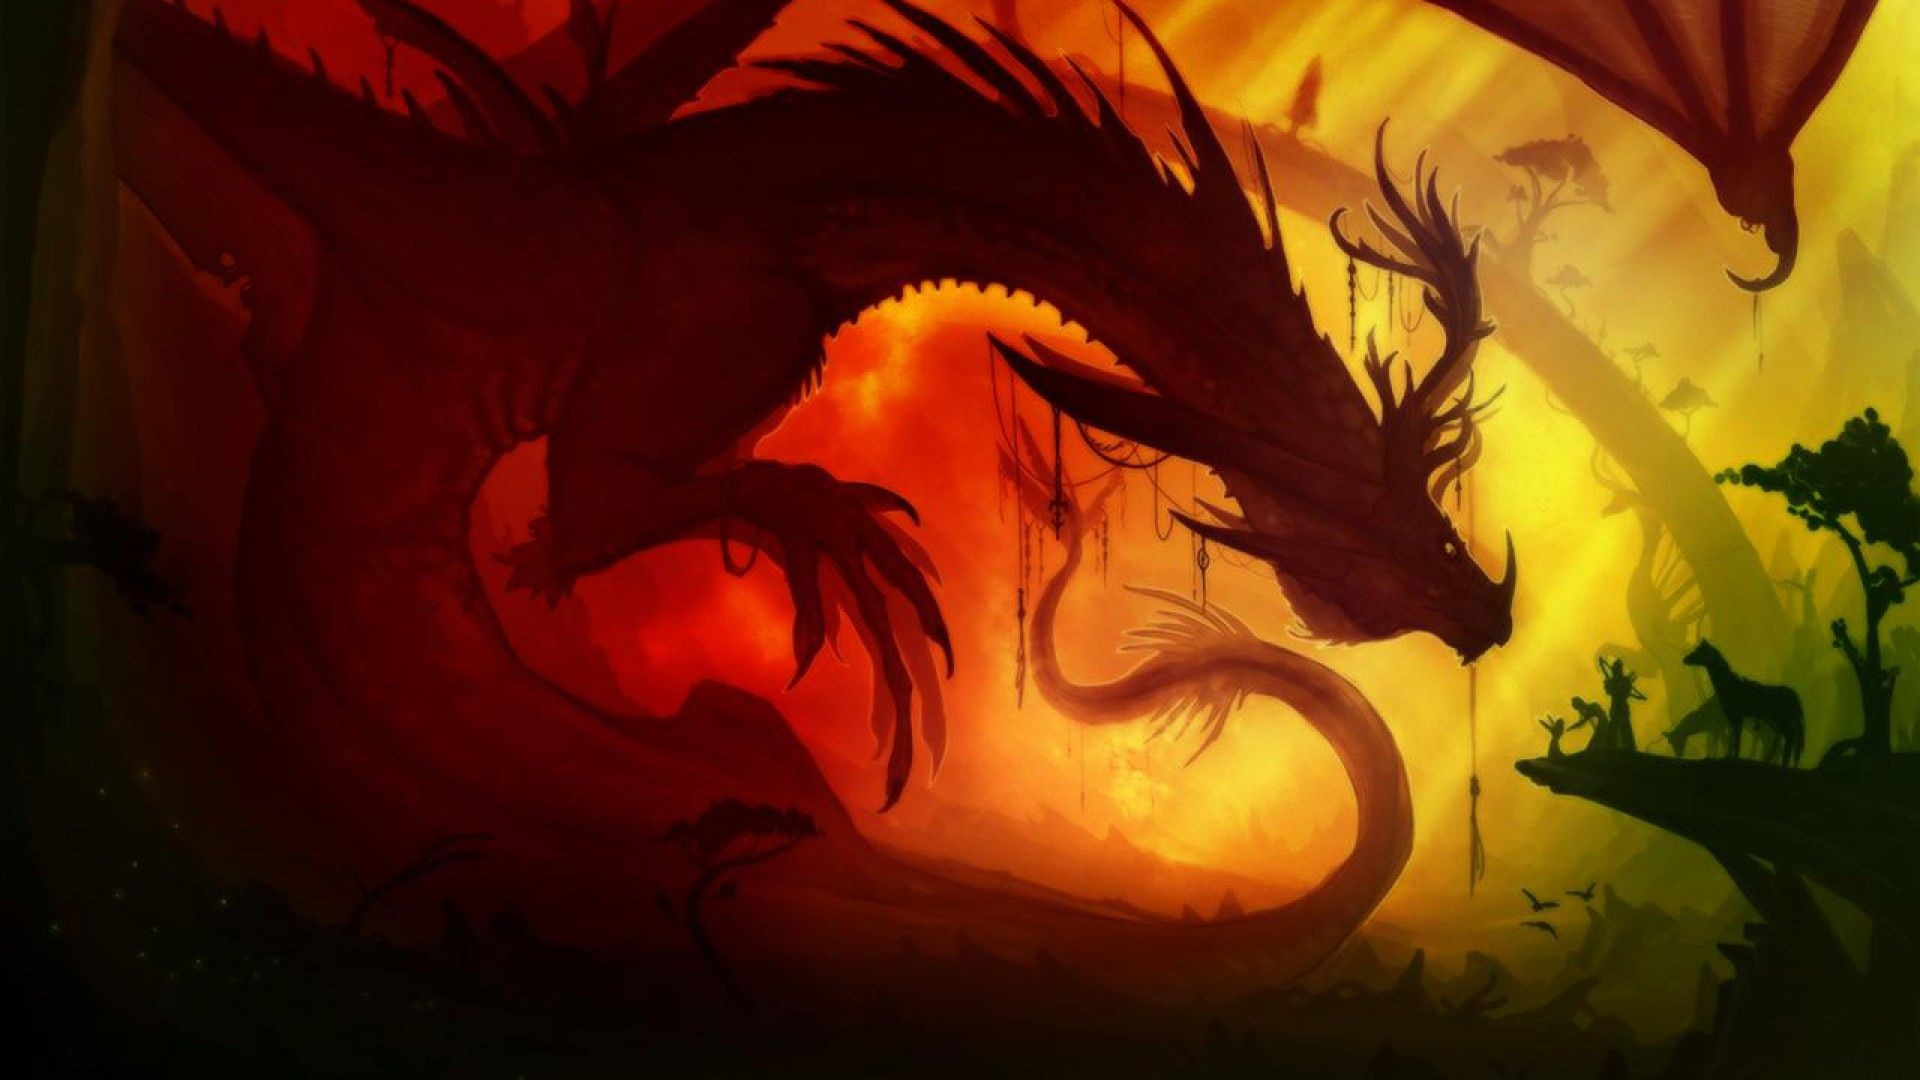 Skyrim Iphone X Wallpaper Dragon Wallpaper Hd 1080p 183 ① Download Free Amazing